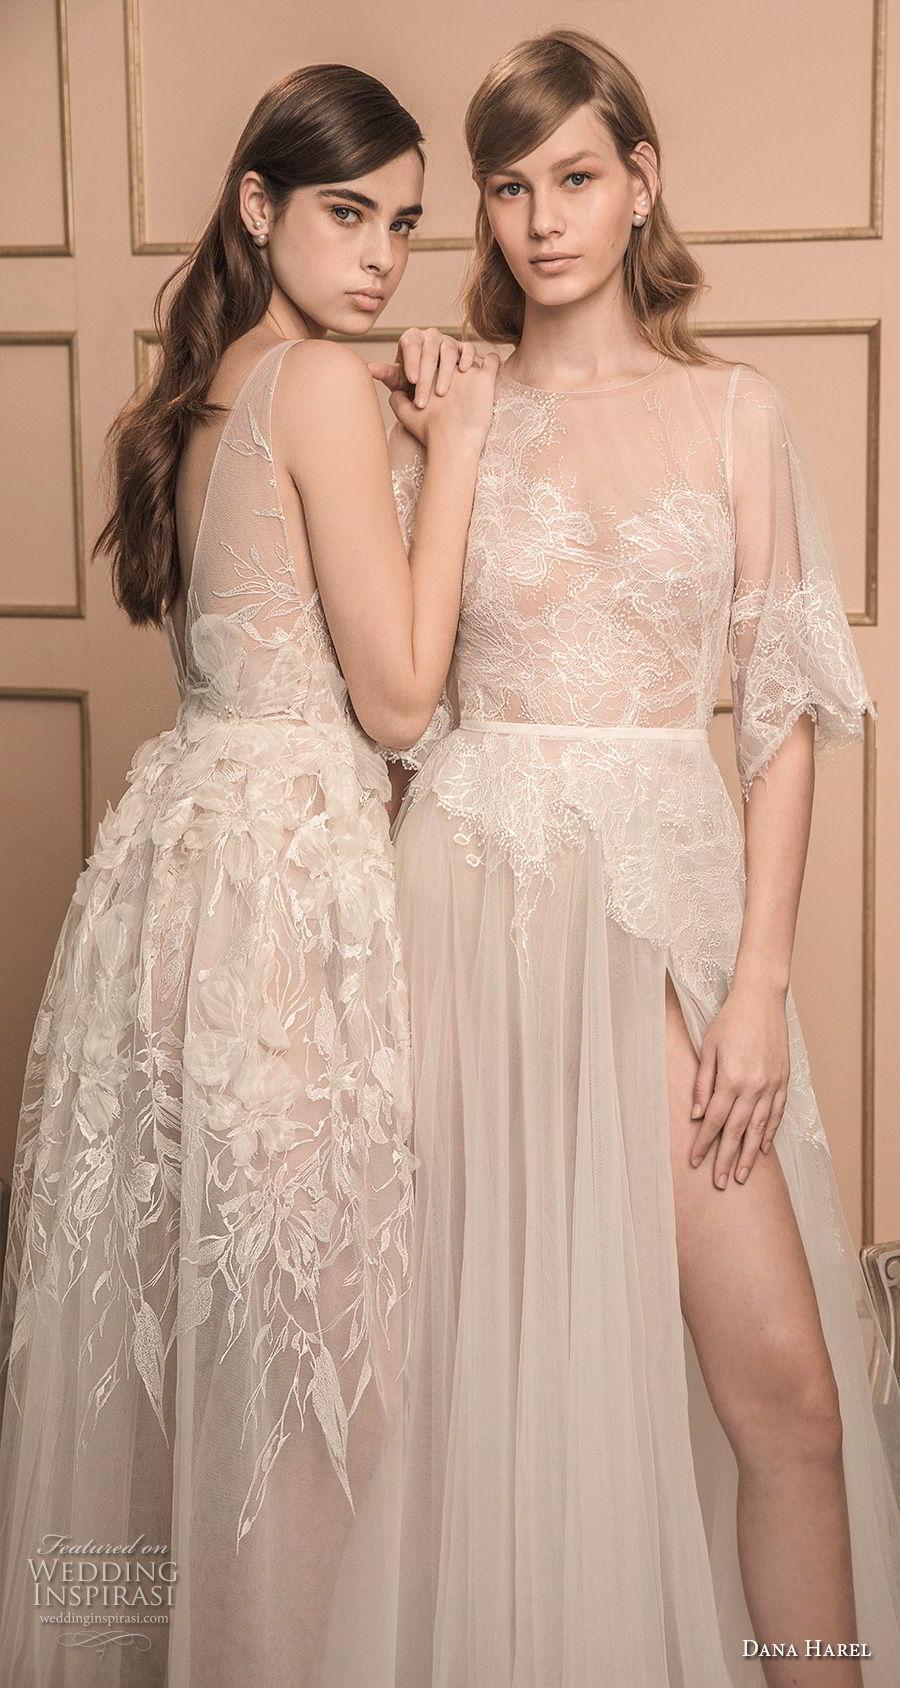 dana harel 2018 bridal half bell sleeves illusion jewel neck heavily embellished bodice high slit skirt romantic a line wedding dress v back sweep train (4) zv